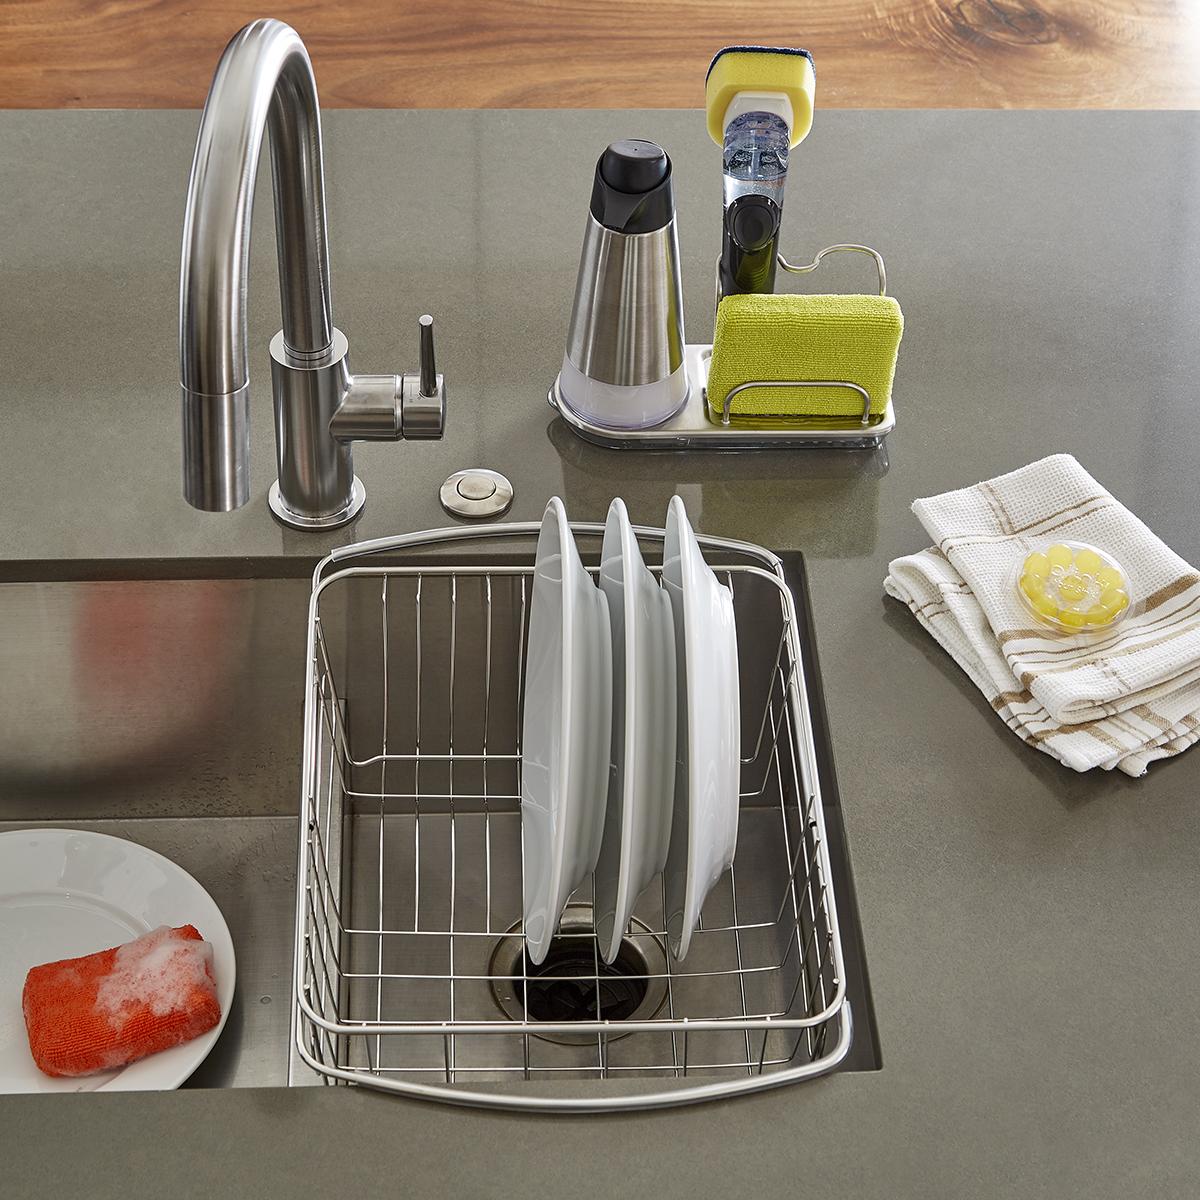 OXO Stainless Steel Sink Organizer